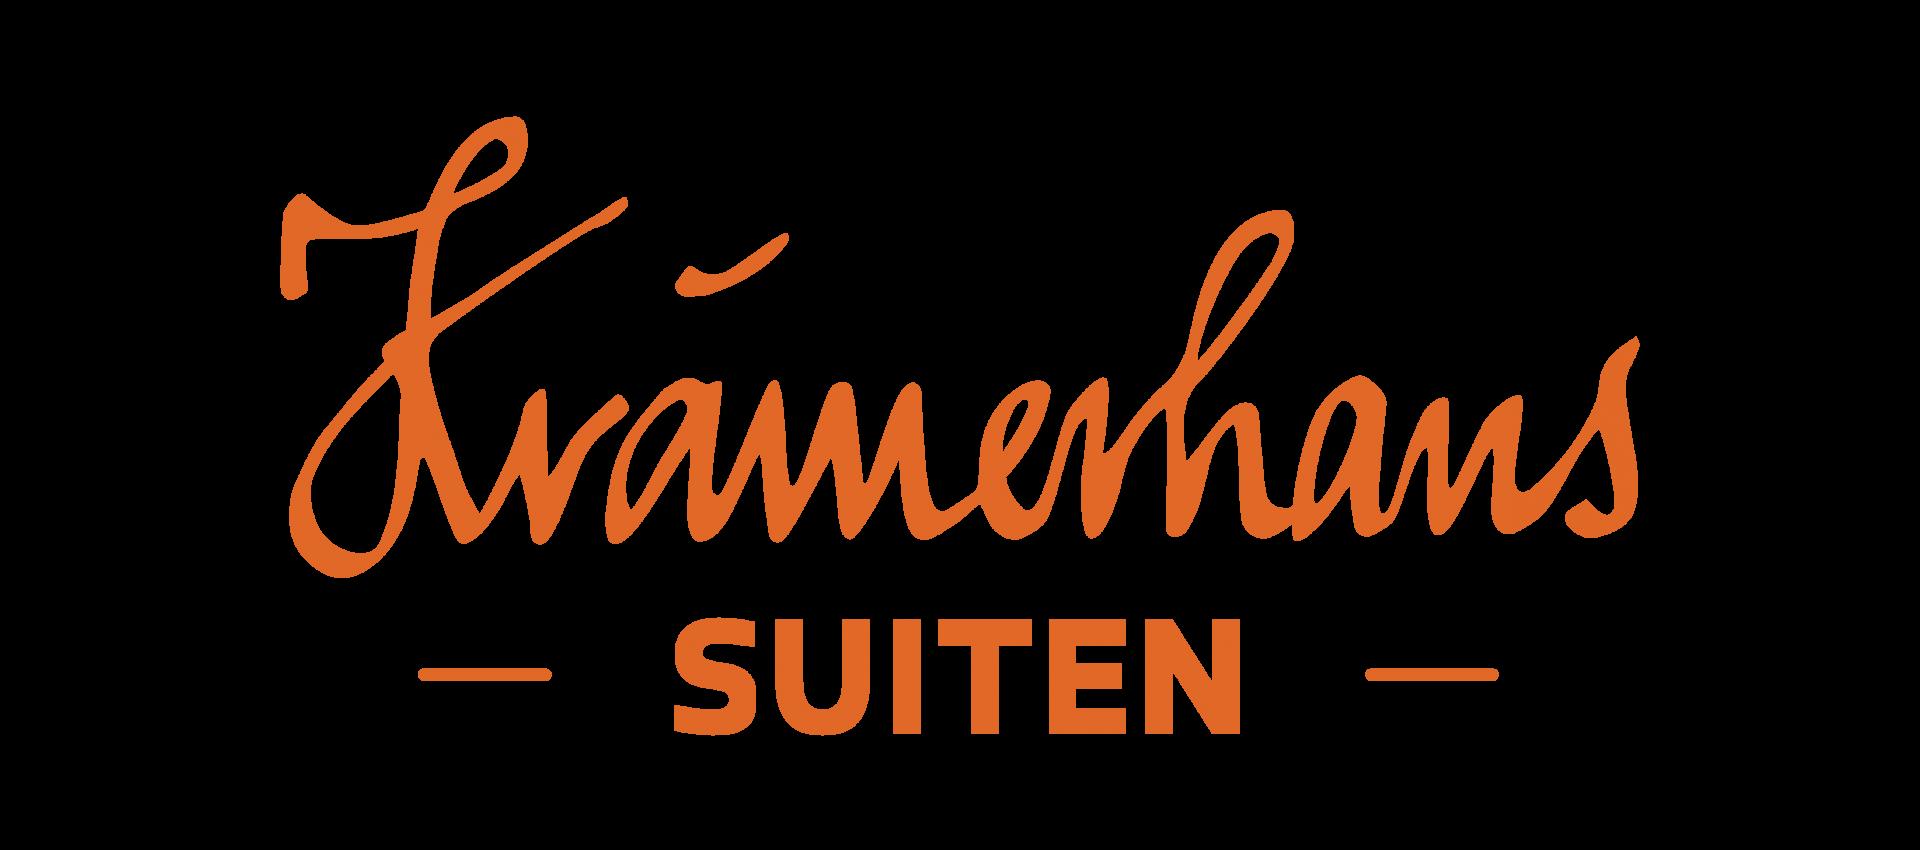 Krämerhaus